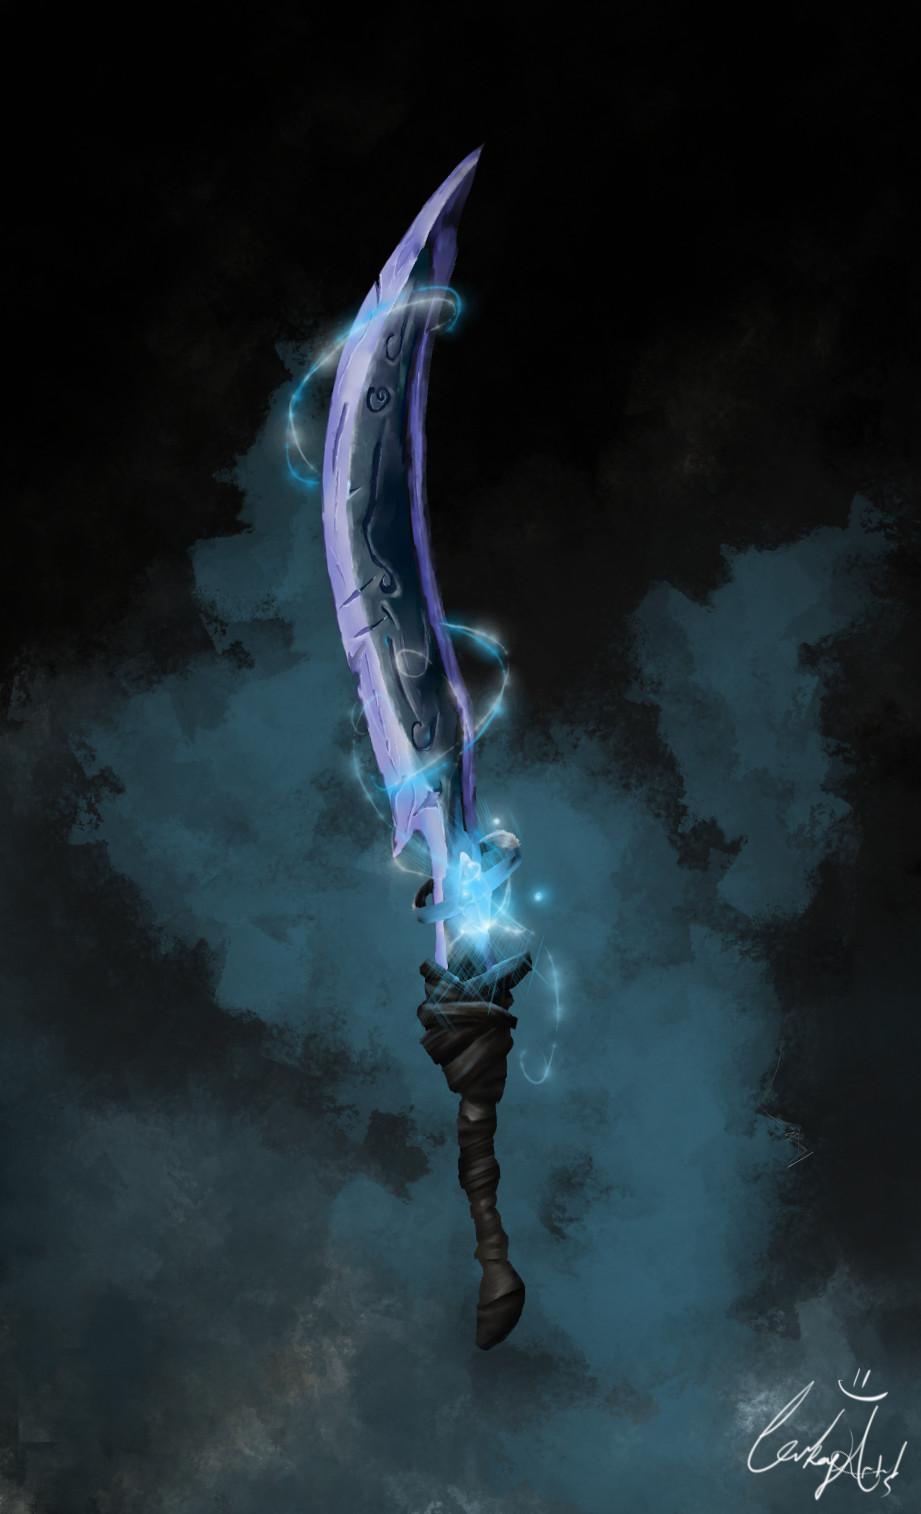 Blizzard-esque sword